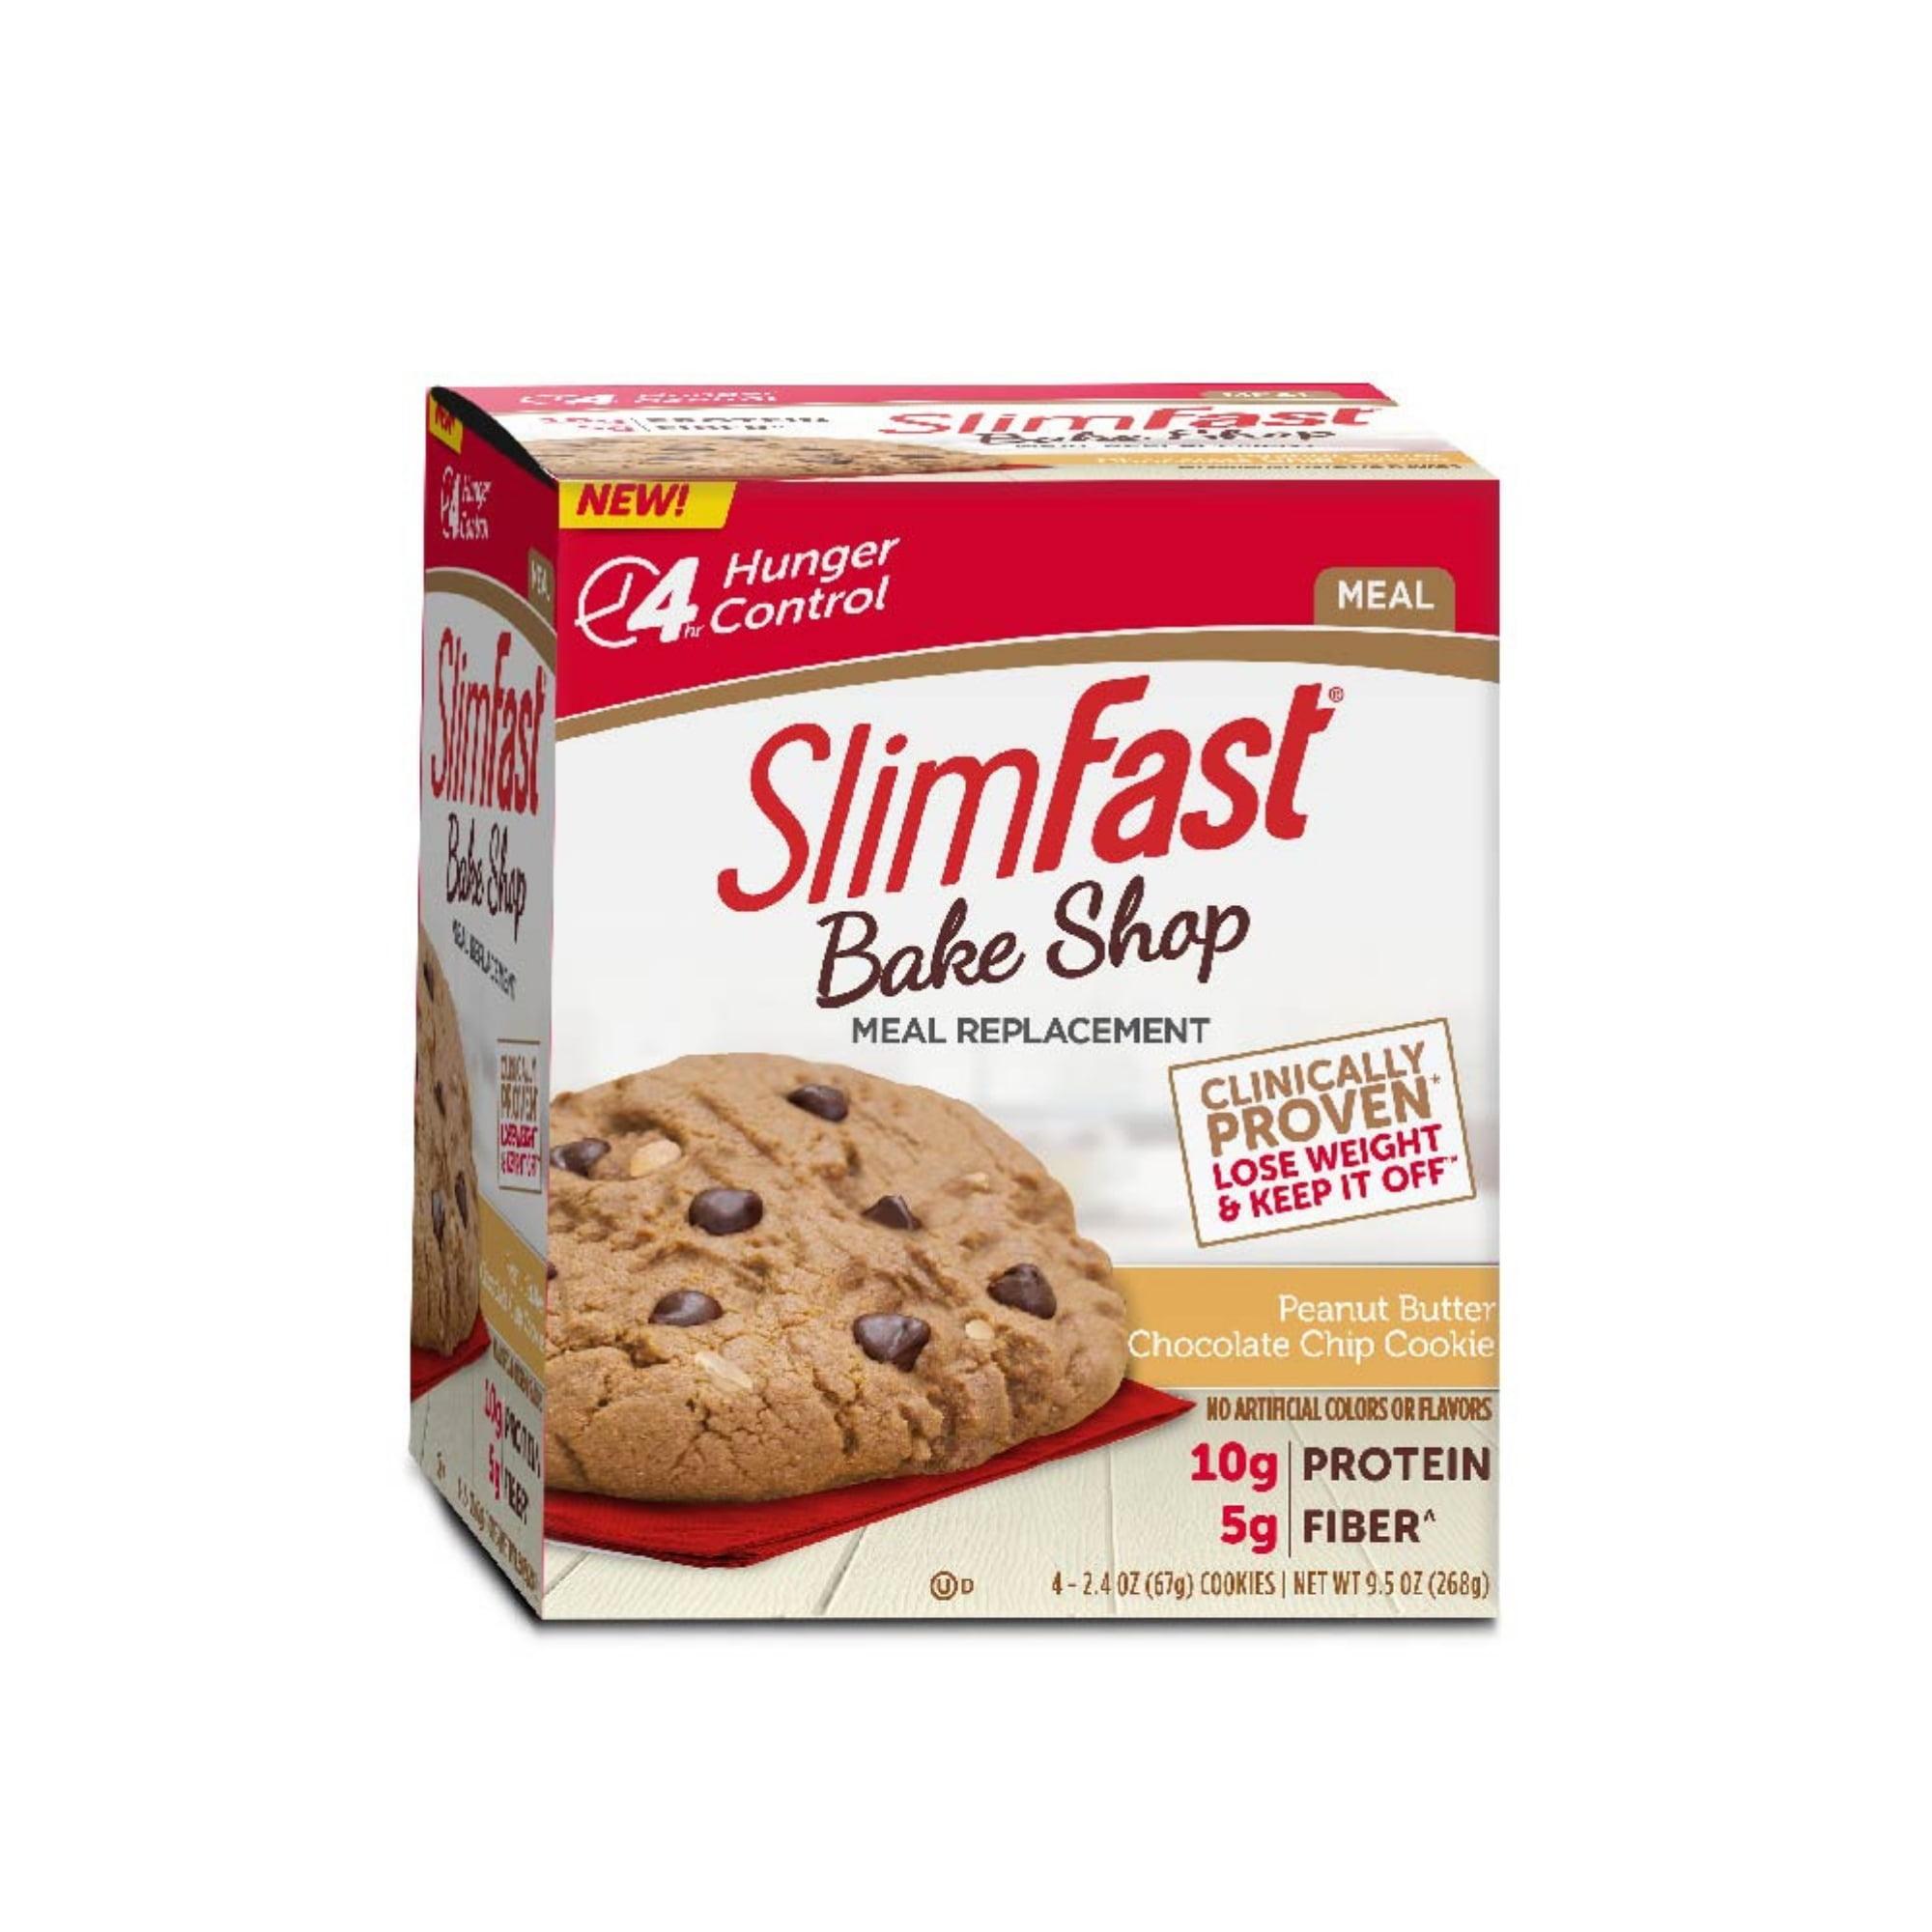 Slimfast Bake Shop Meal Replacement Peanut Butter Chocolate Chip Cookie 2 4 Oz 4 Count Walmart Inventory Checker Brickseek